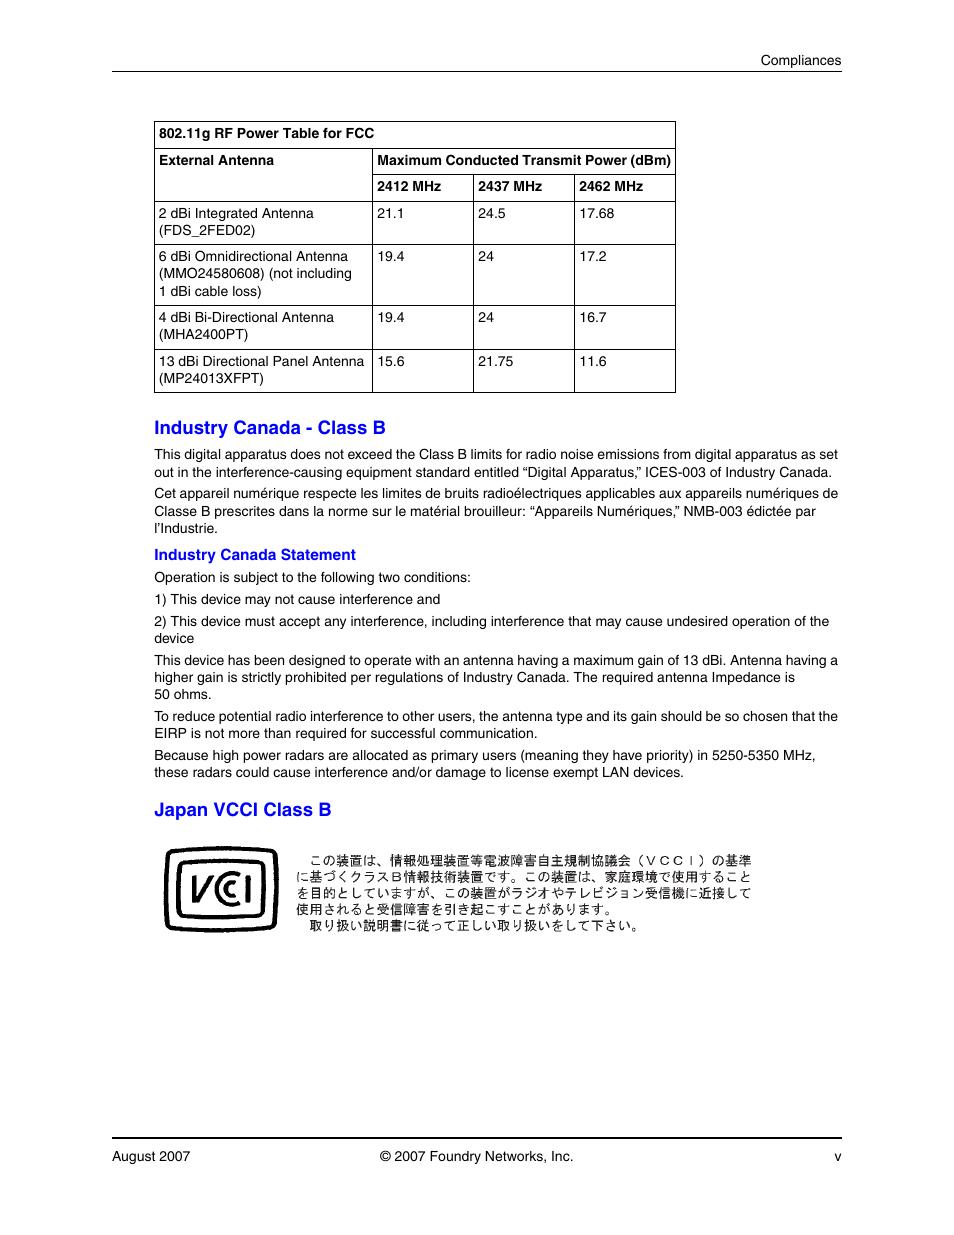 industry canada class b japan vcci class b foundry networks rh manualsdir com Access Point Foundry Foundry Networks Logo